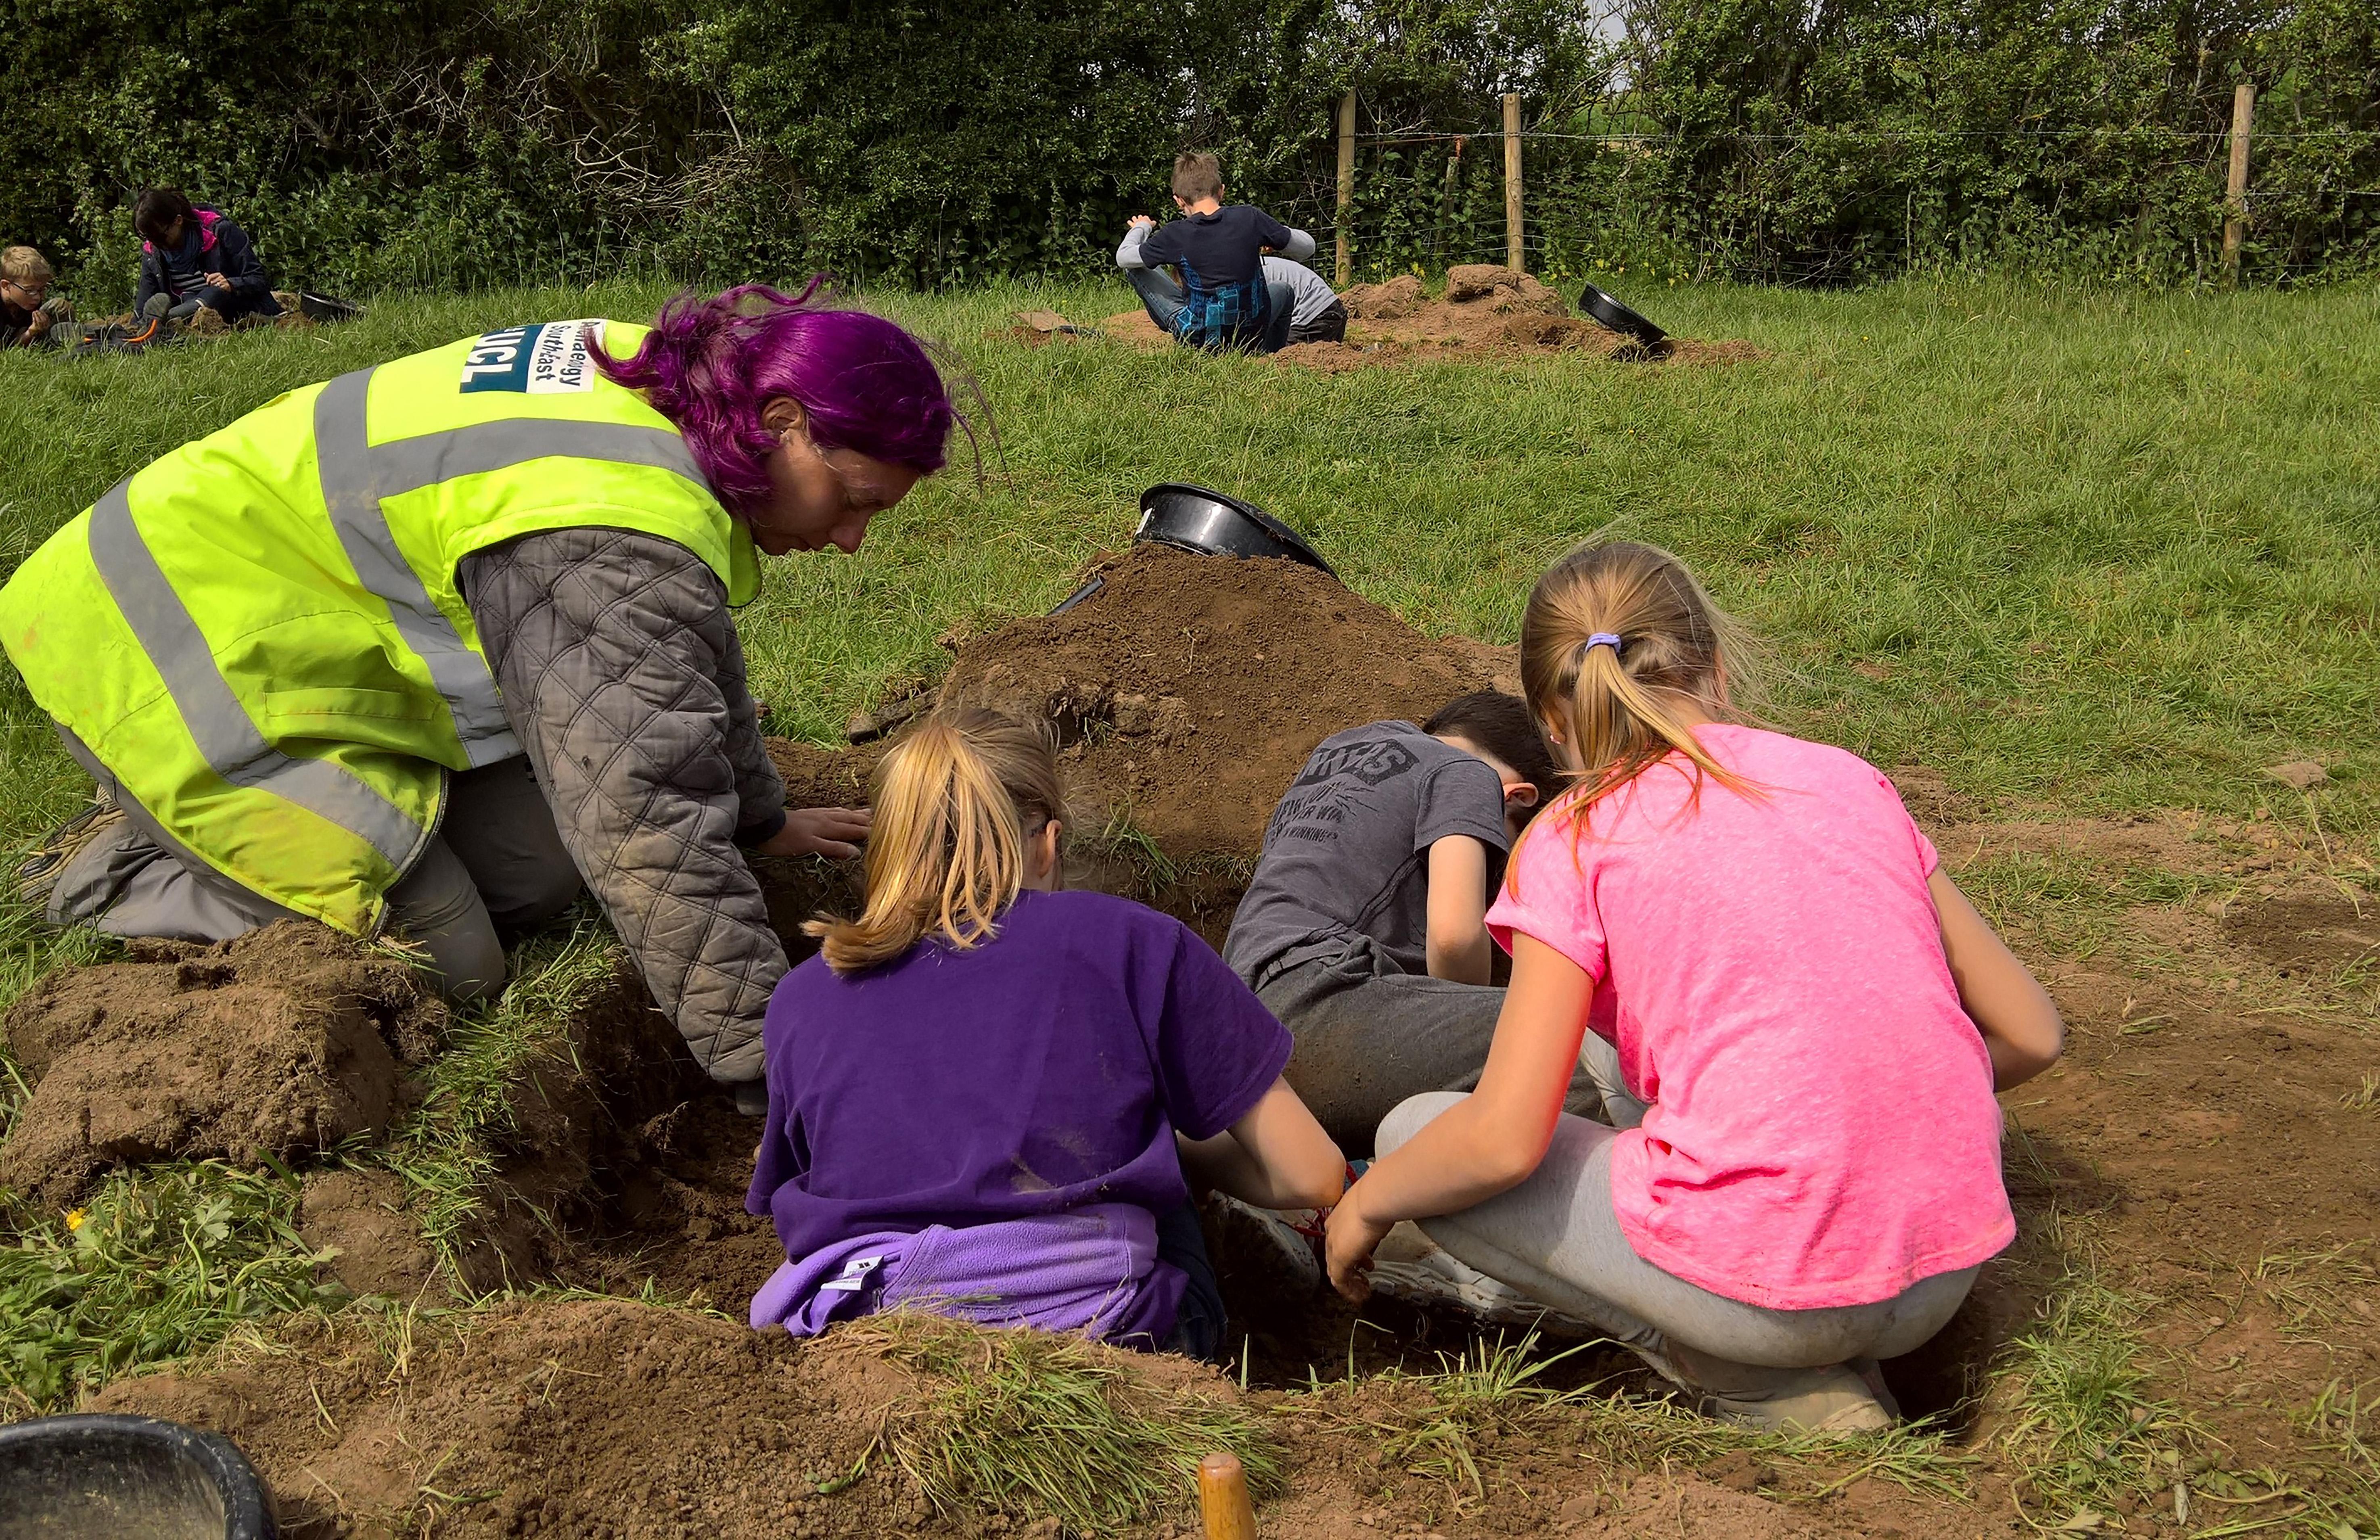 An archaeologist helps children excavate